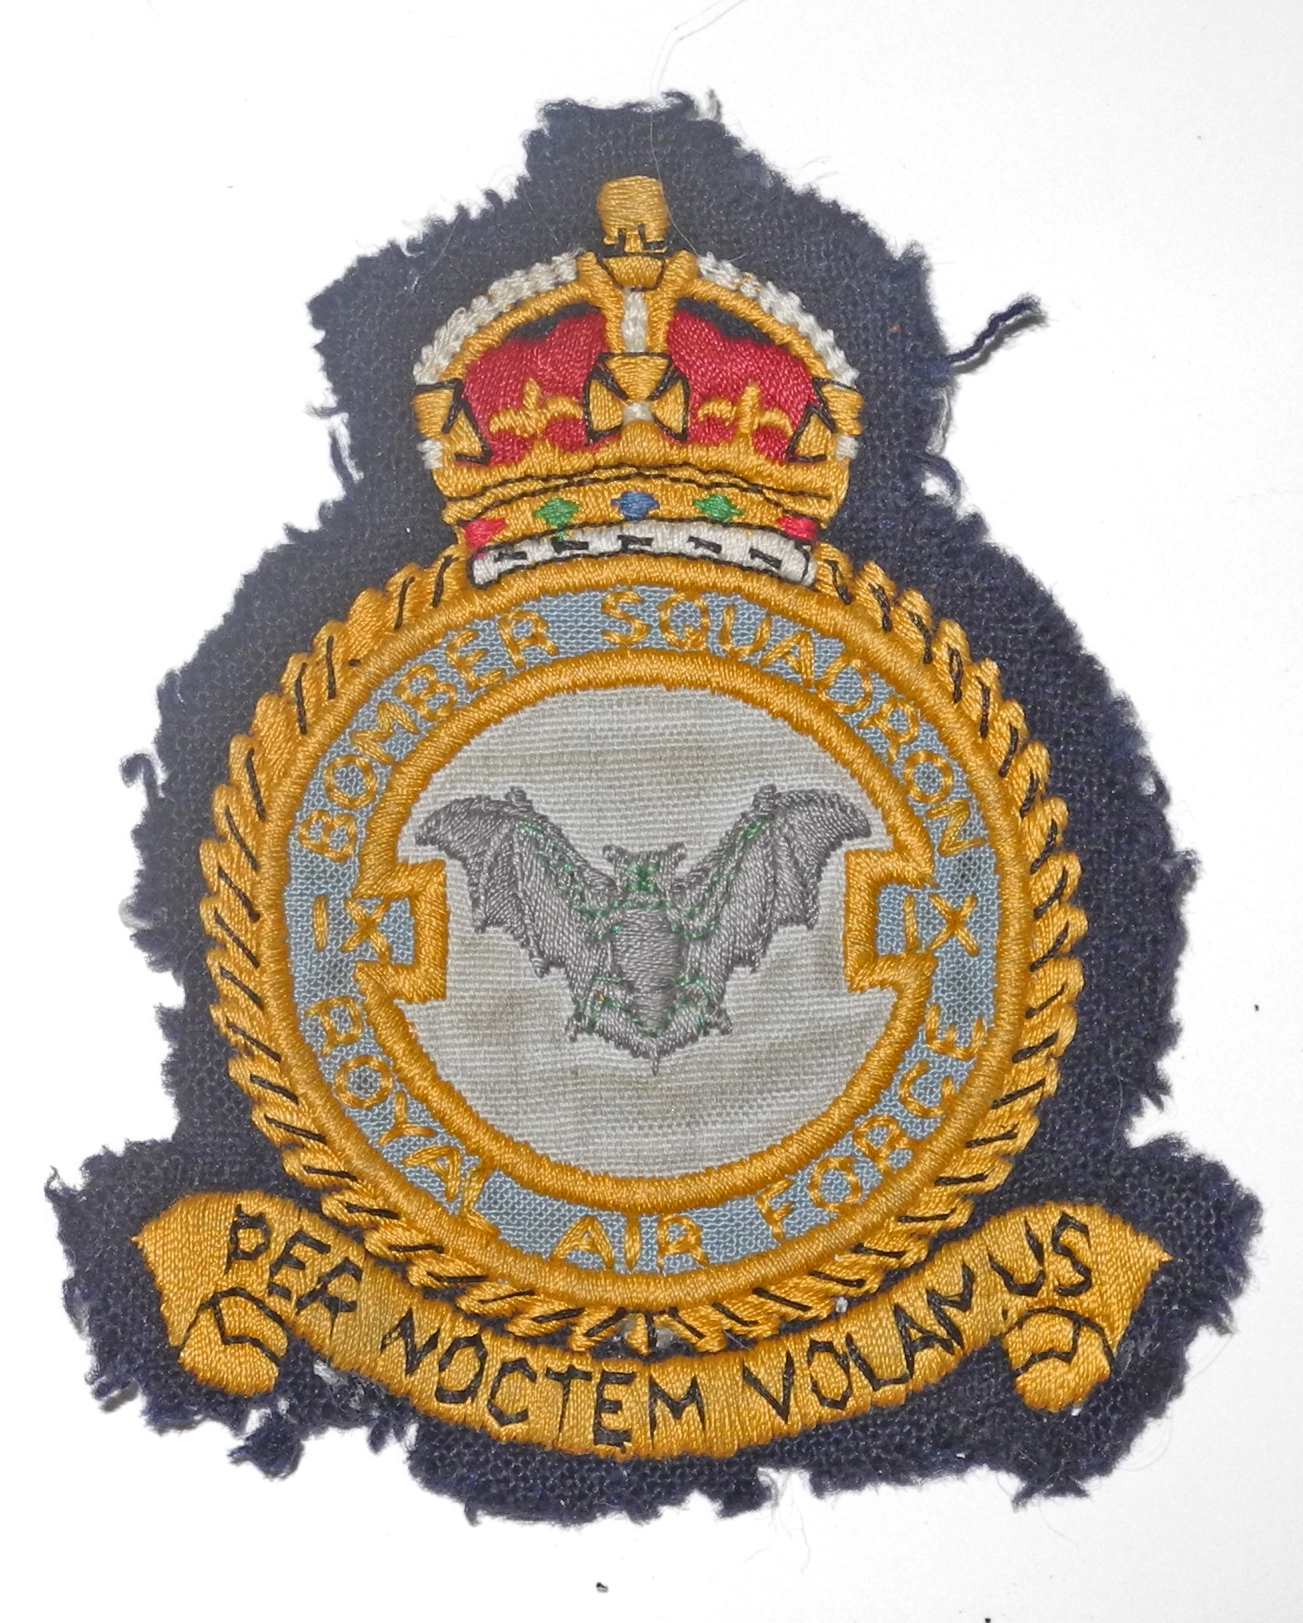 RAF IX squadron badge